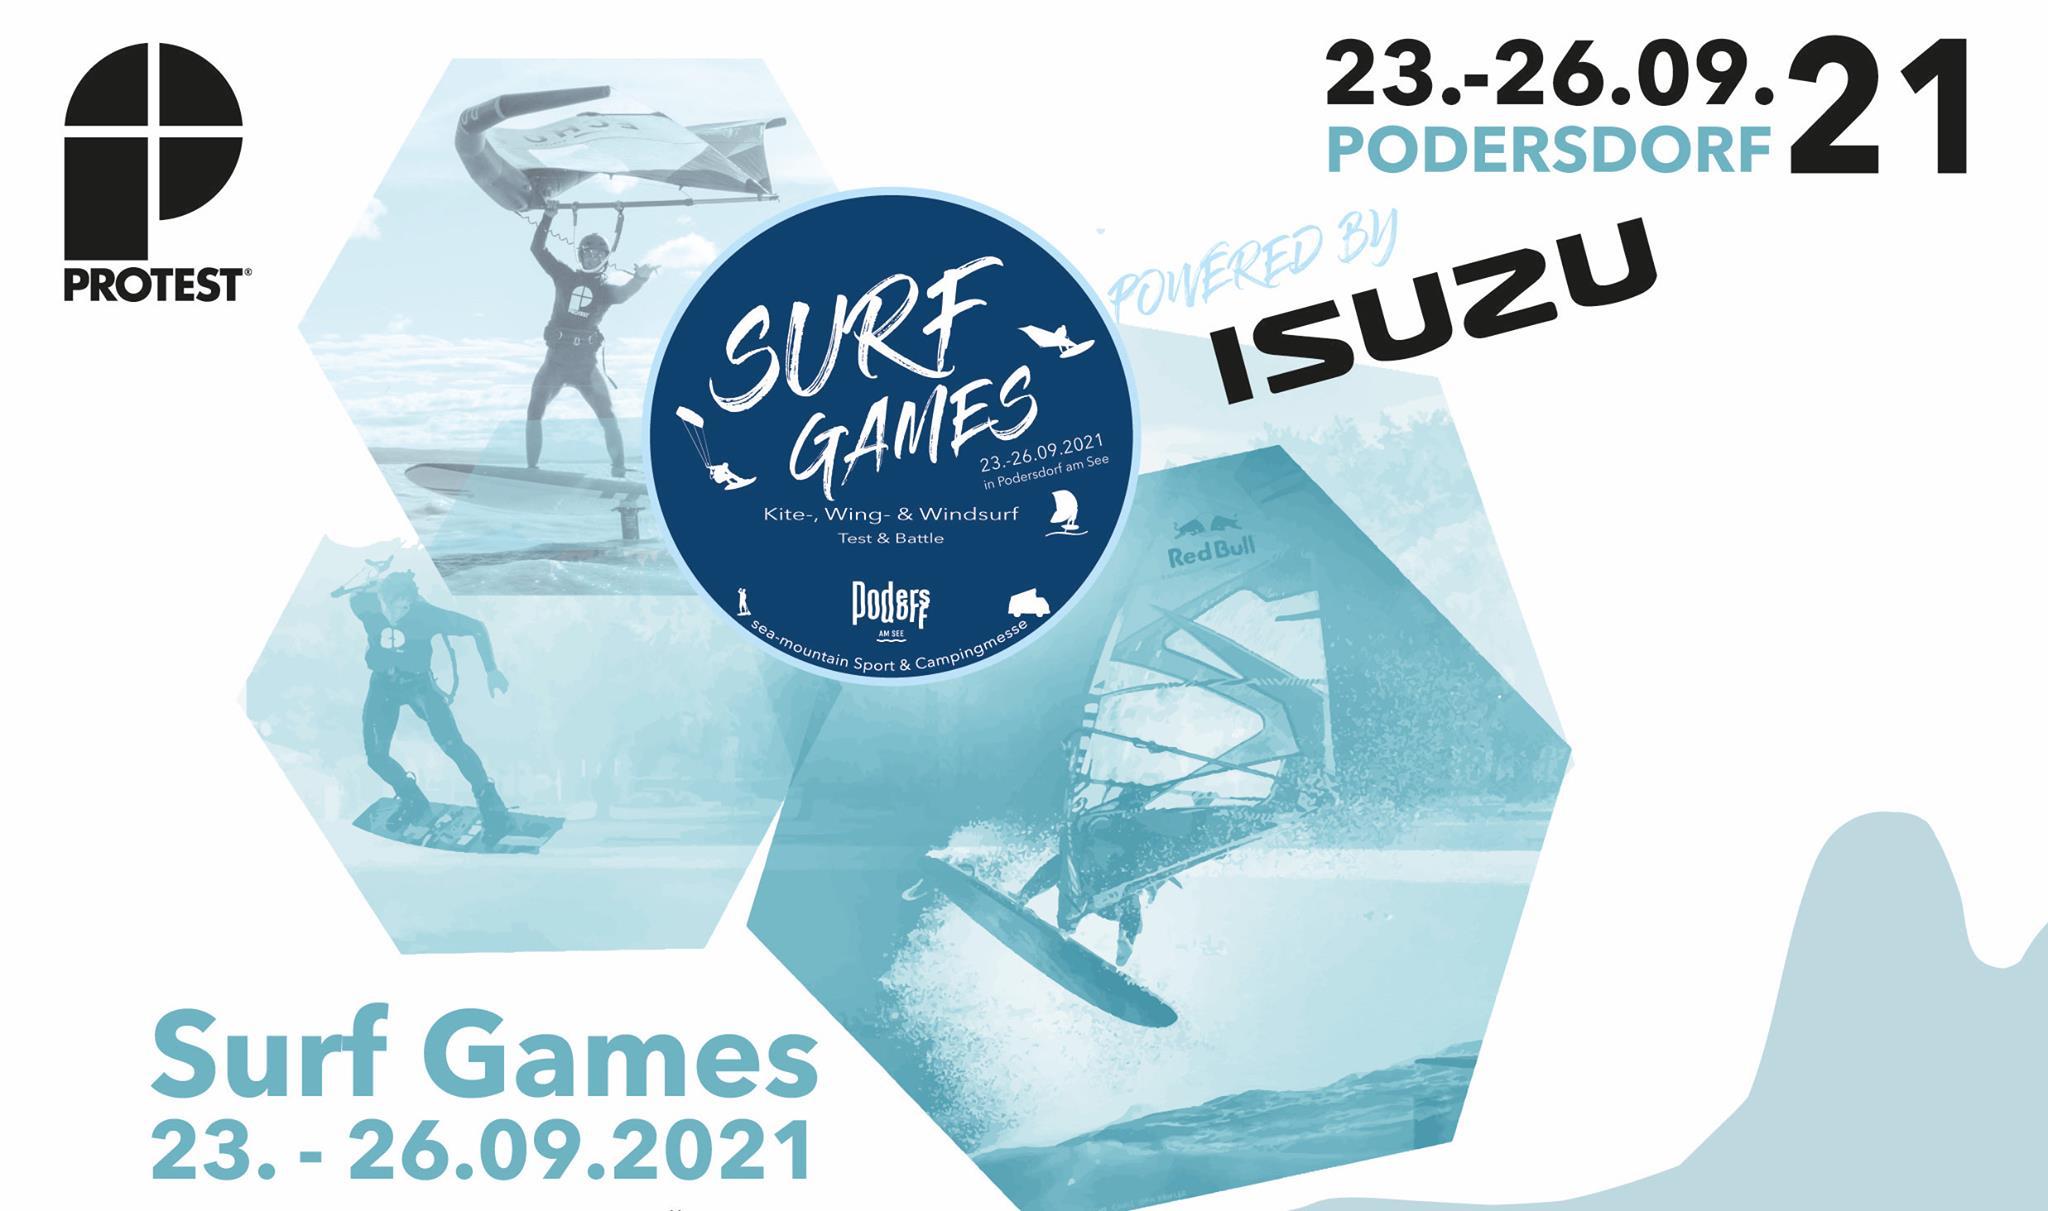 Meet and Greet @ Surfgames Podersdorf